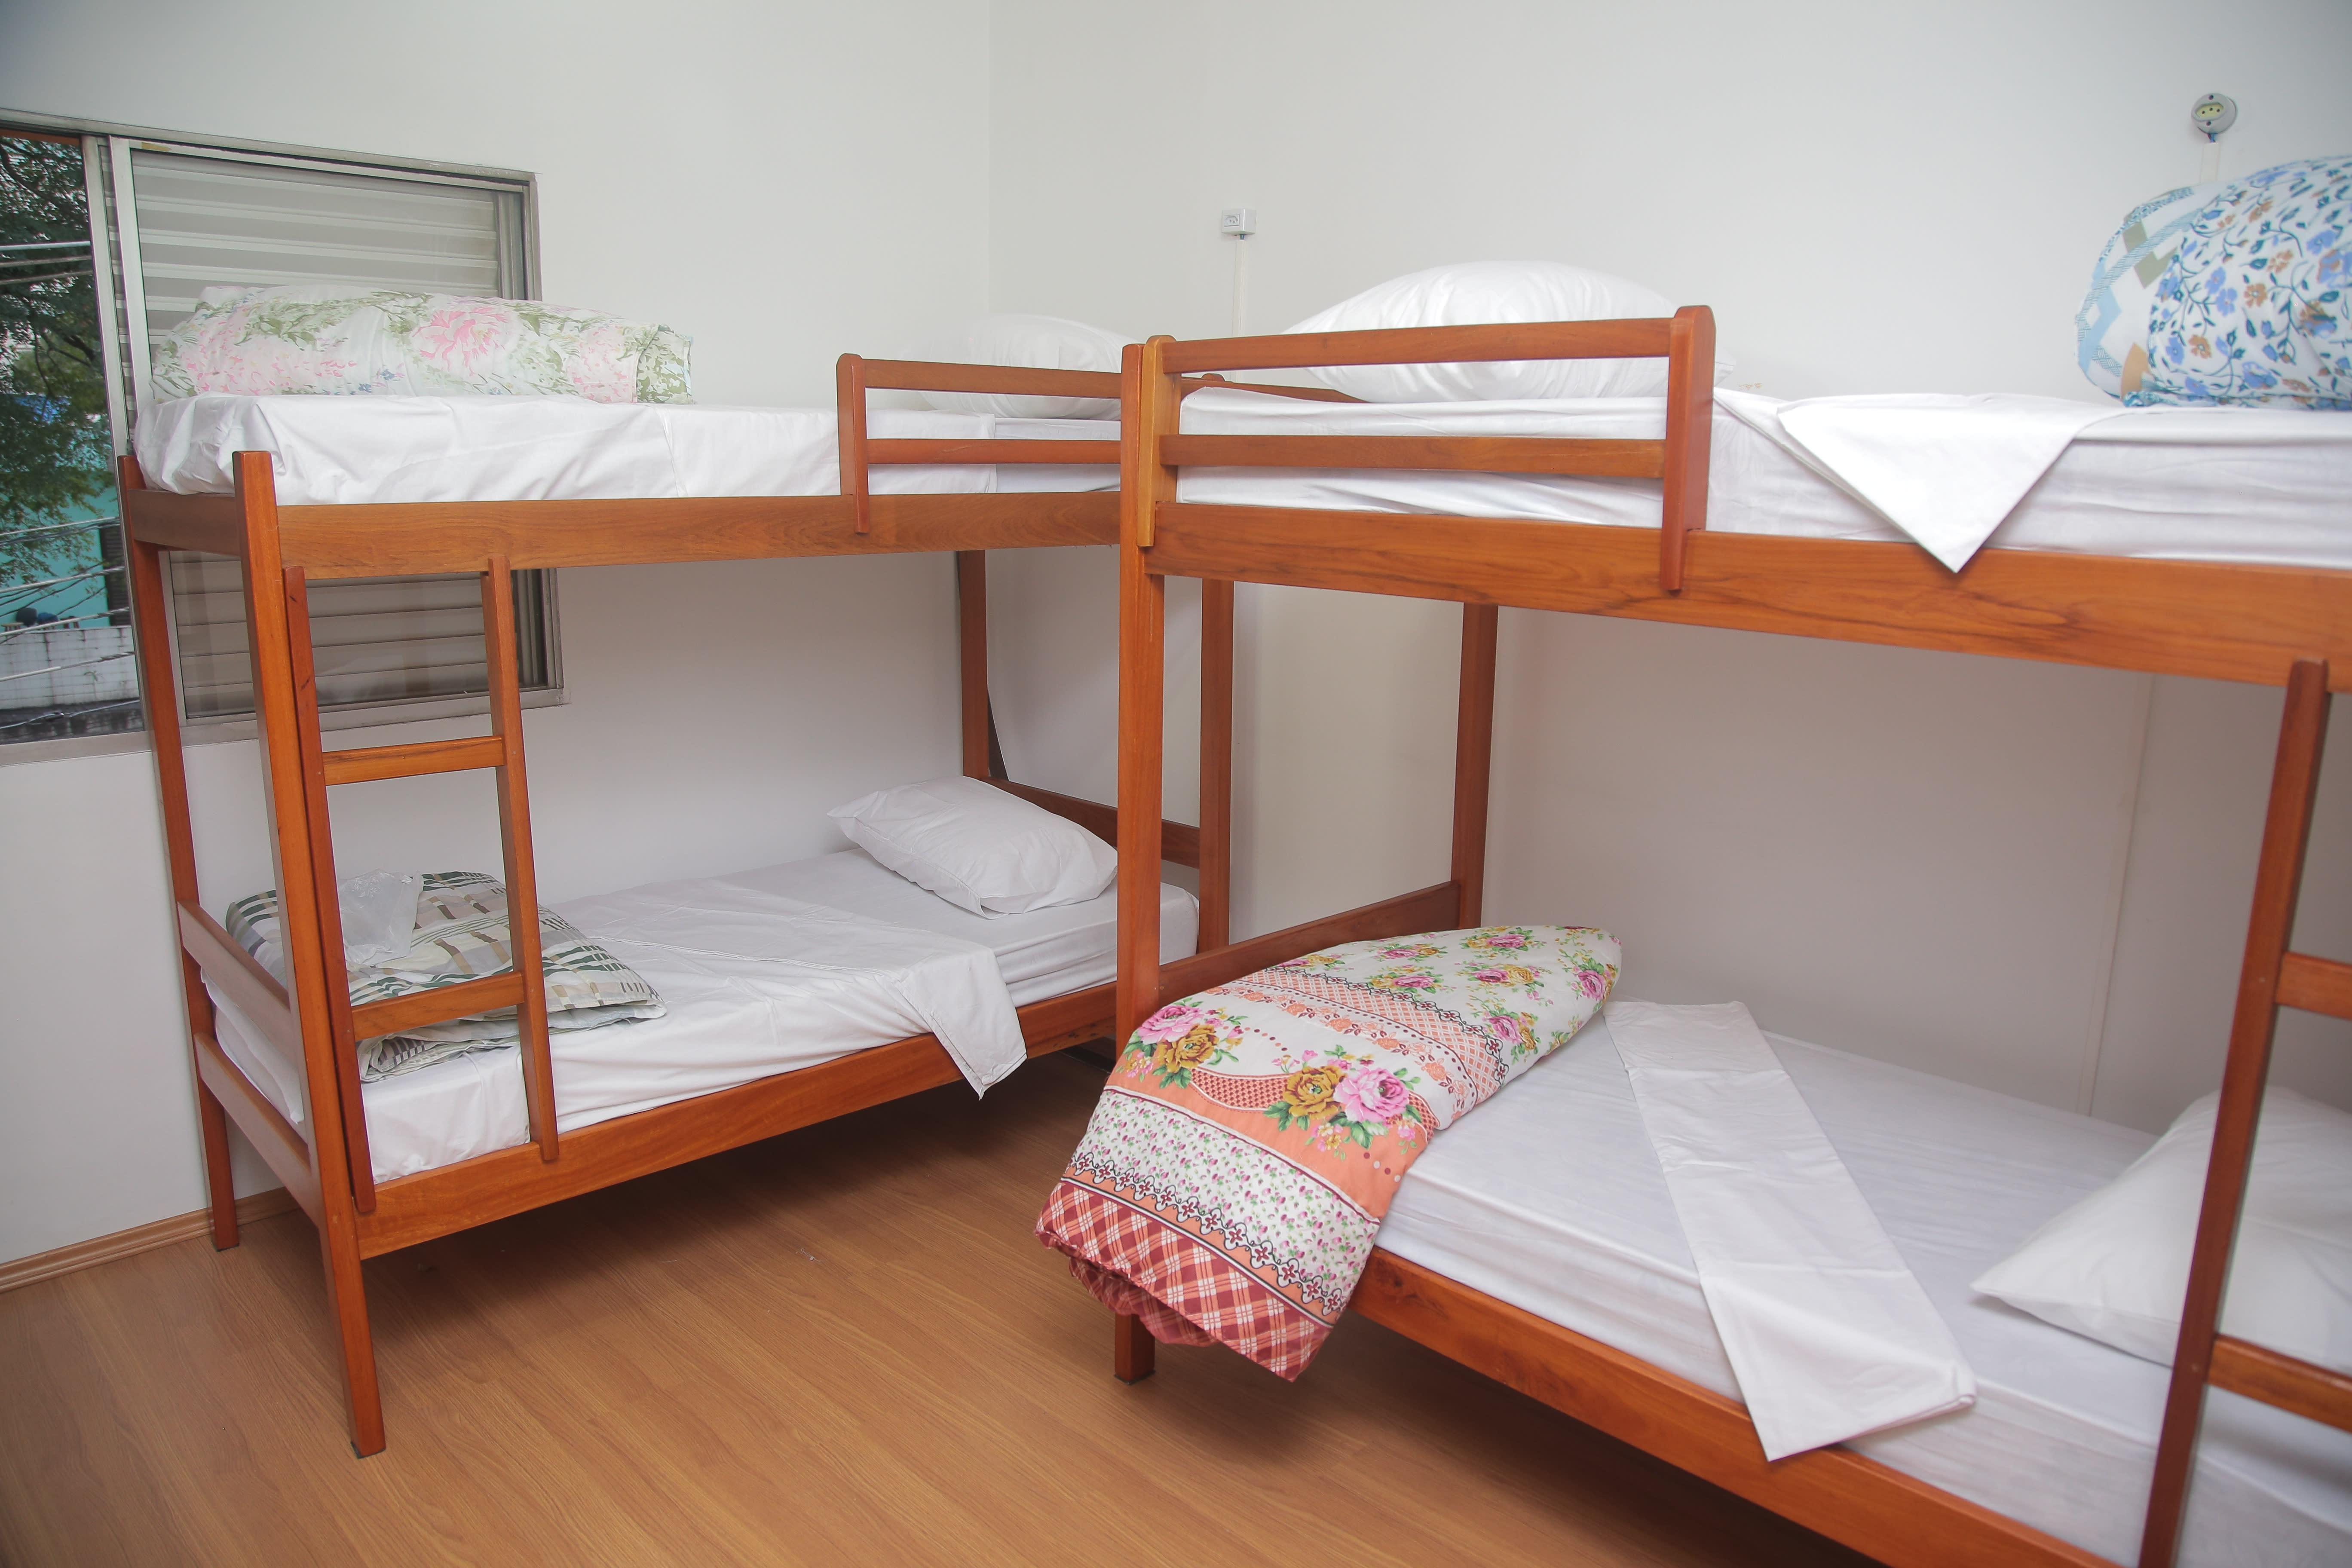 HOSTEL - Today Hostel